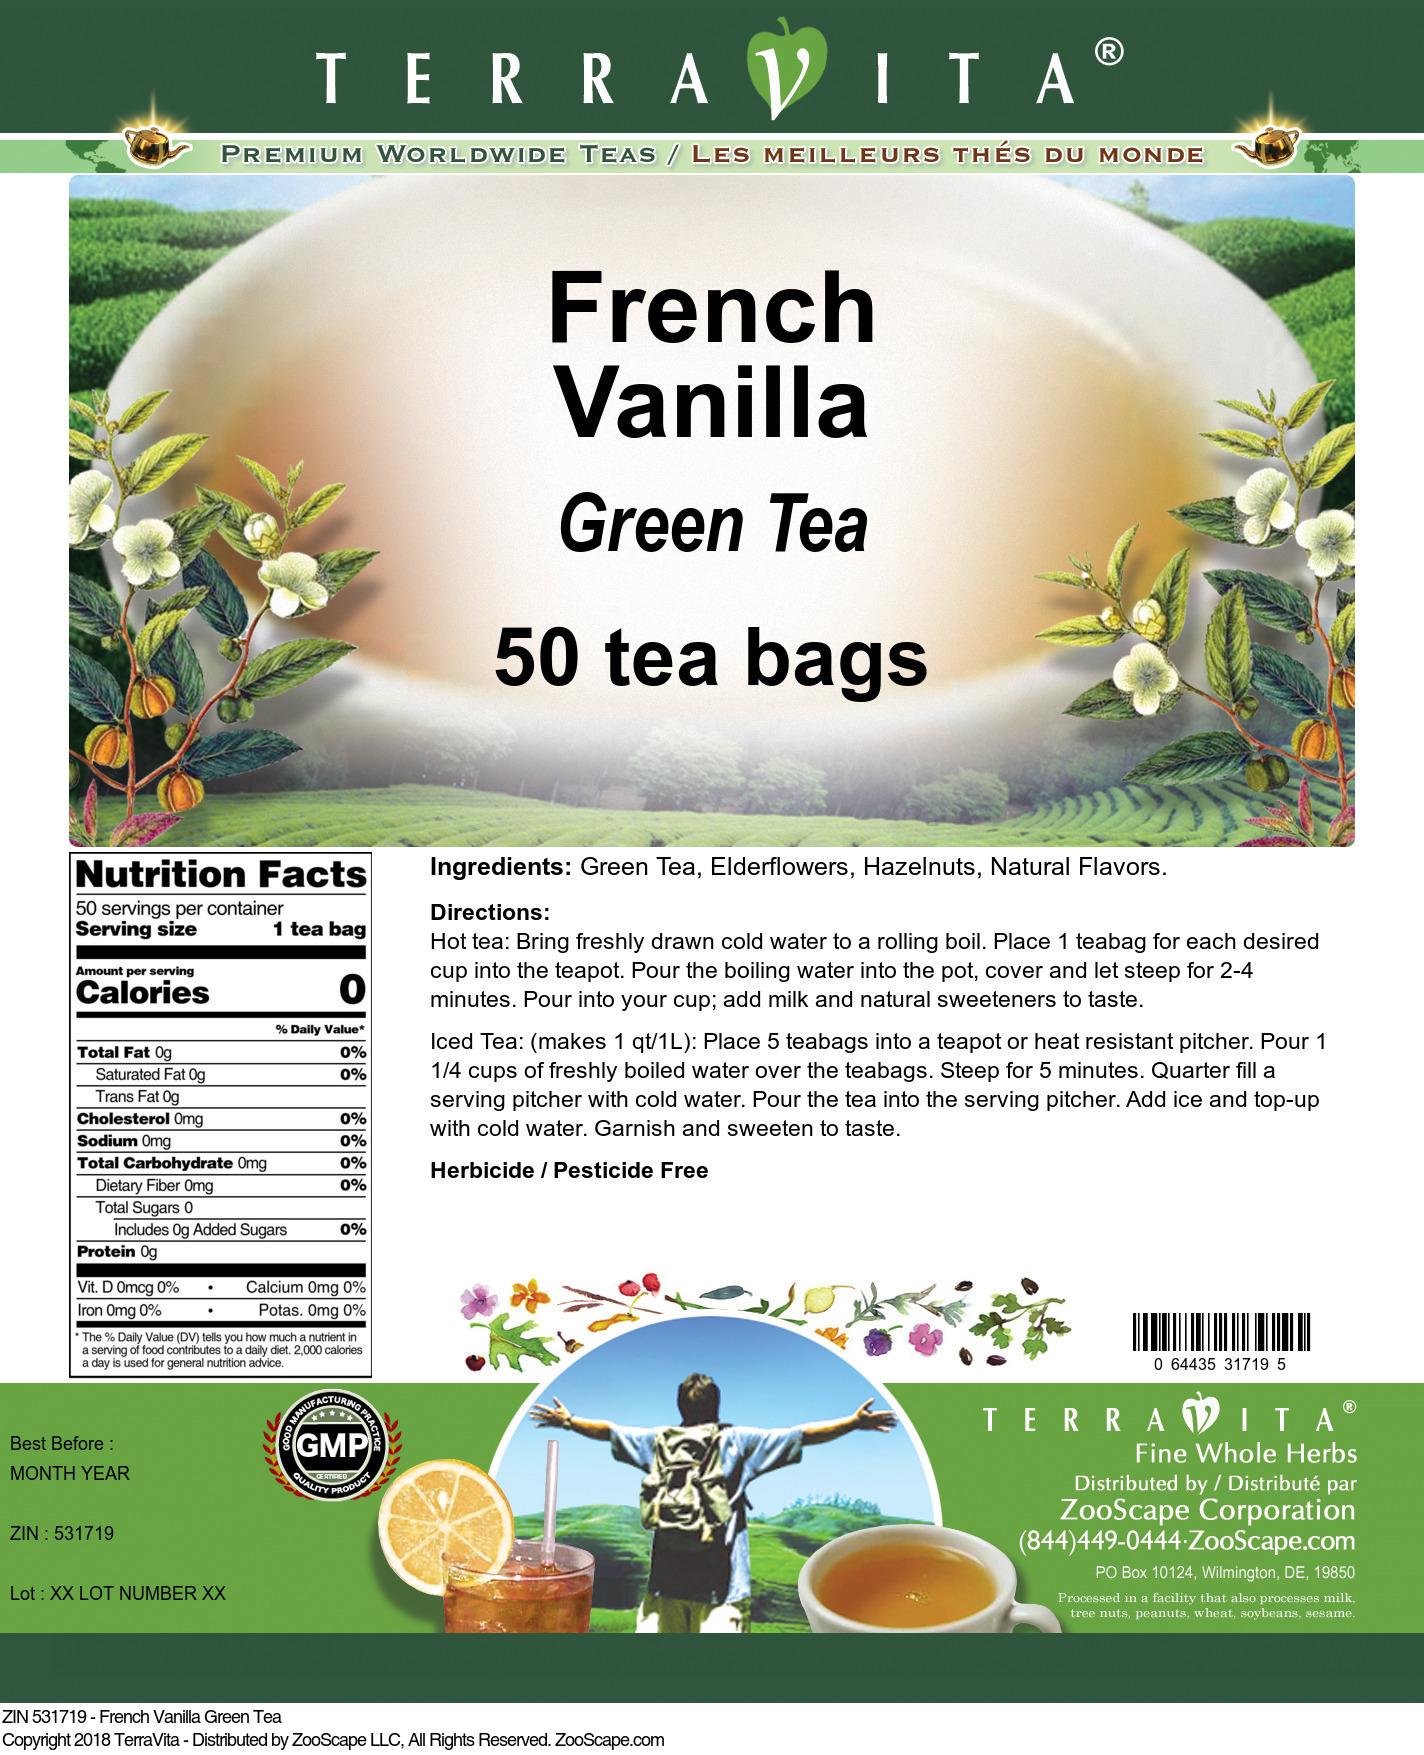 French Vanilla Green Tea